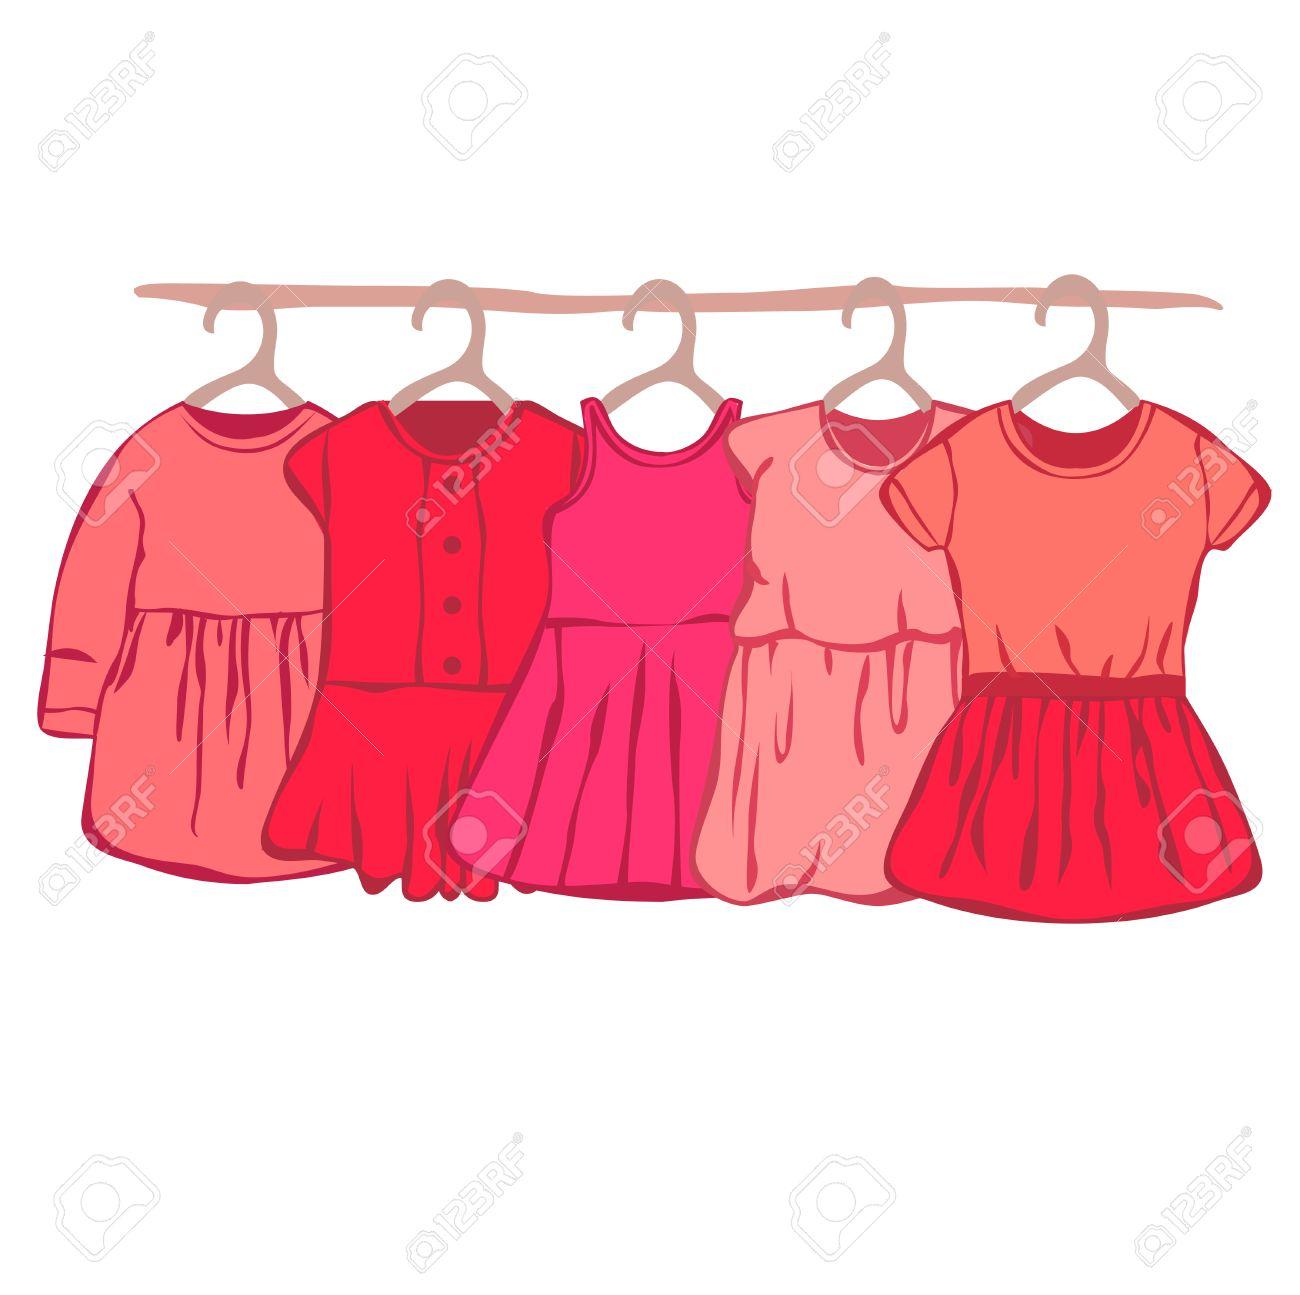 Garderobe clipart  Bébé Robe Du Cintre. Garde-robe Pour Petite Fille. Clip Art Libres ...